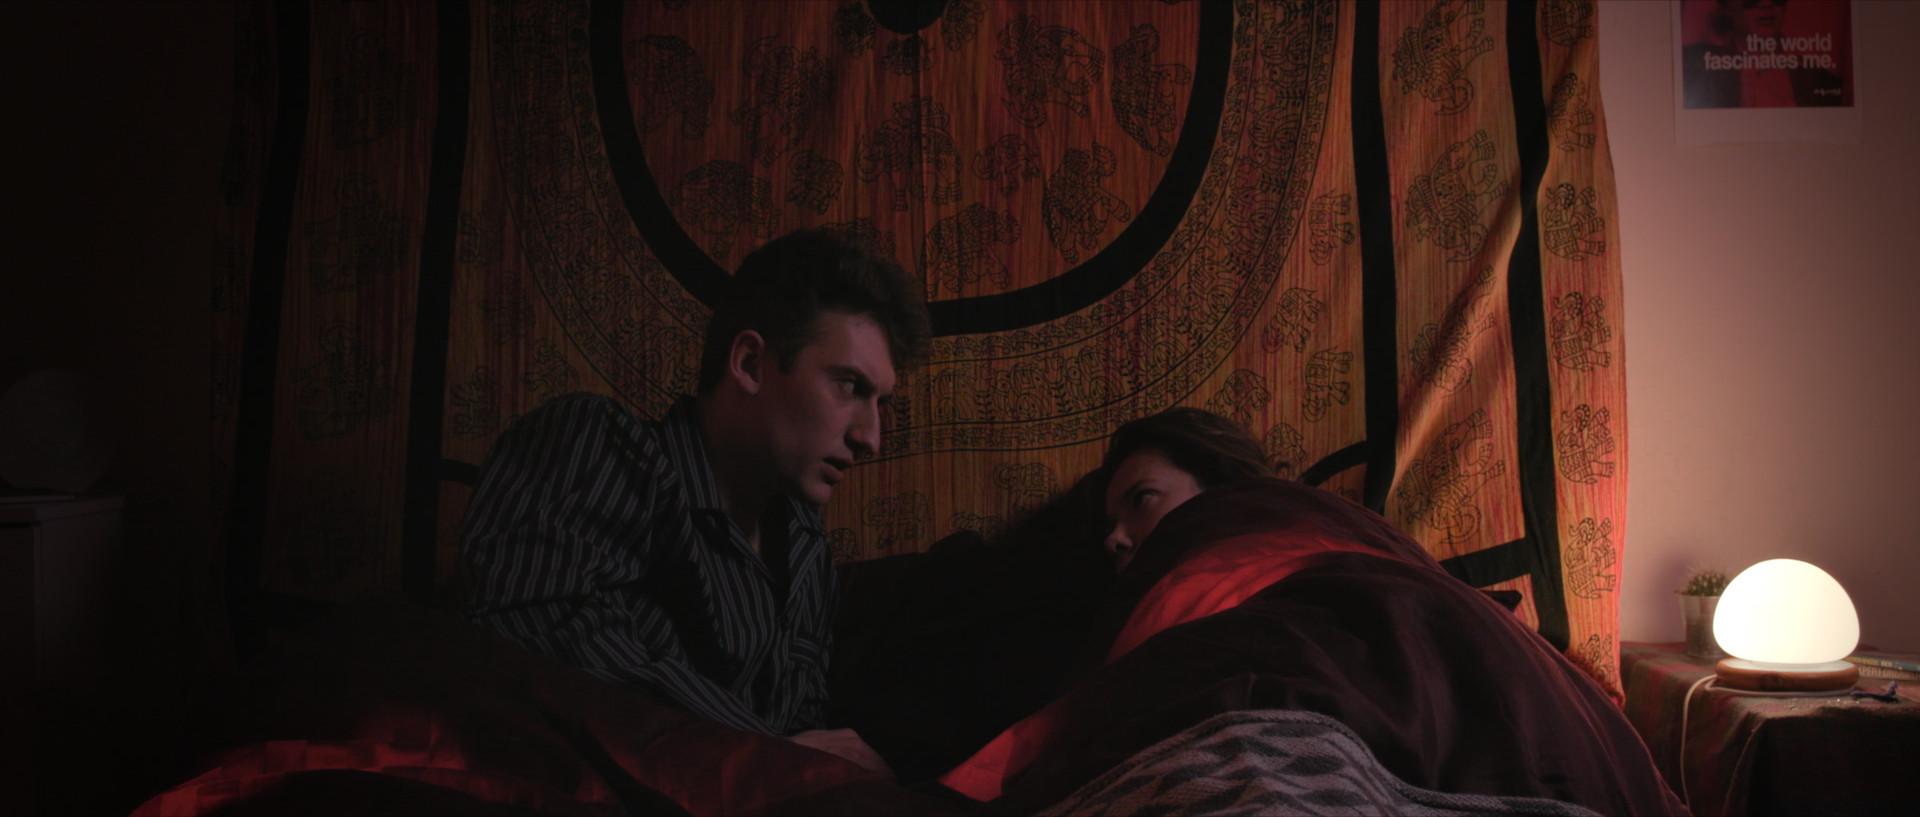 James Gulliford (Gary) and Louise Hoare (Meg) in Sleep Tight